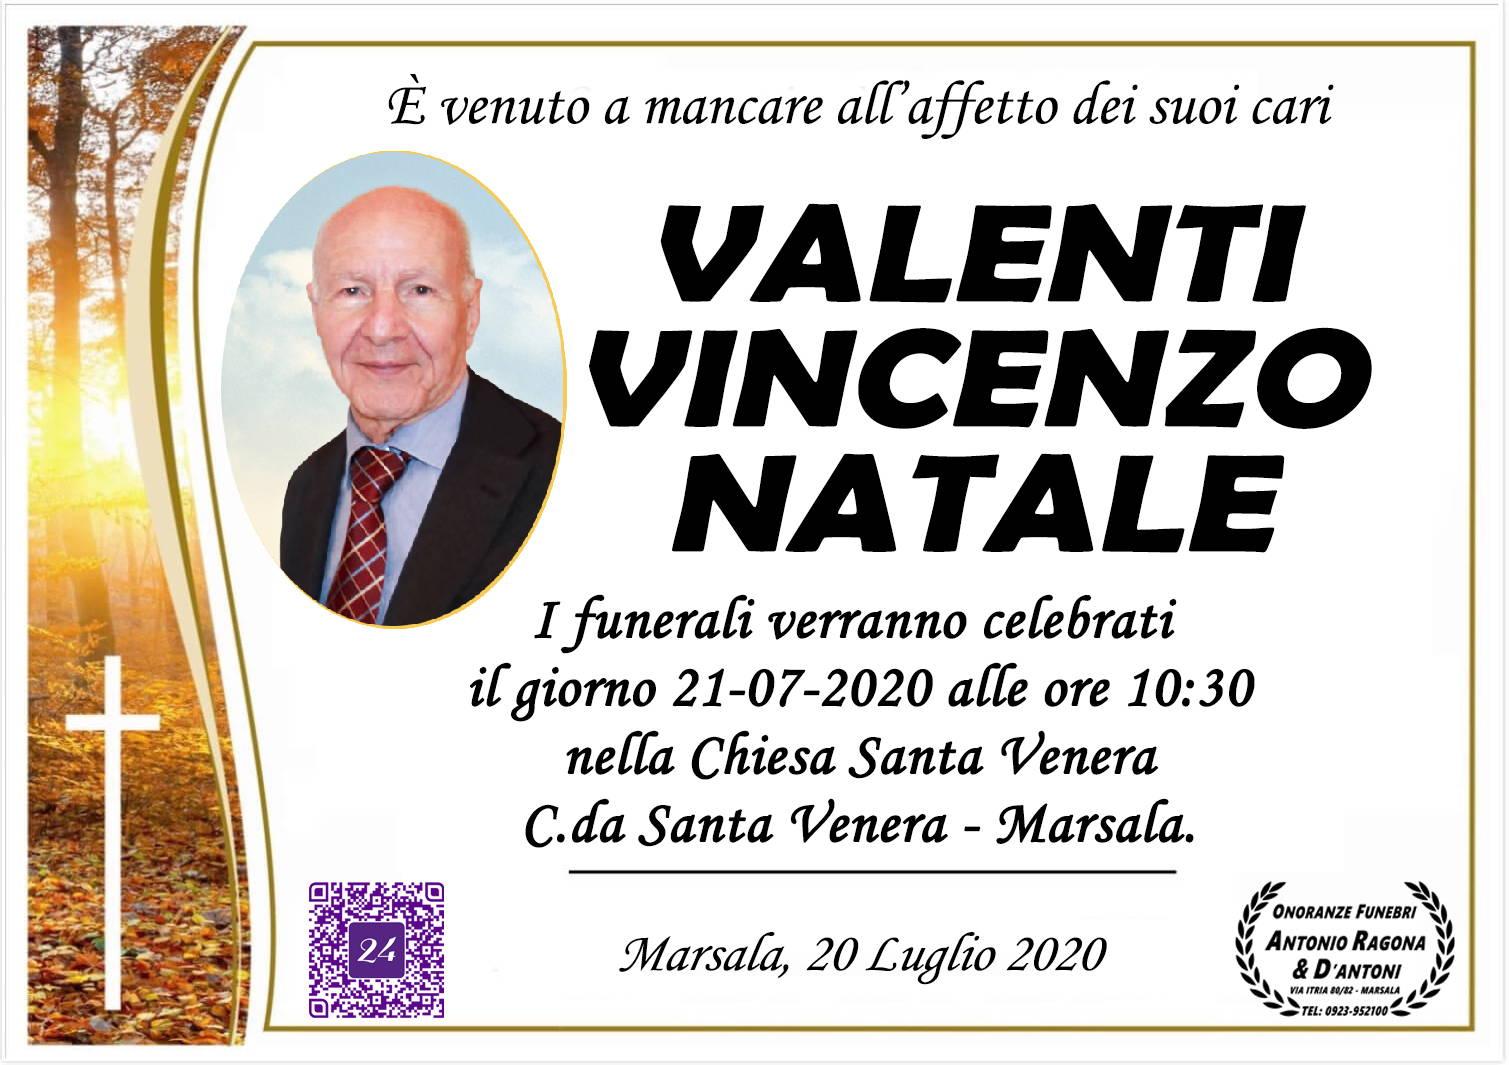 Vincenzo Natale Valenti